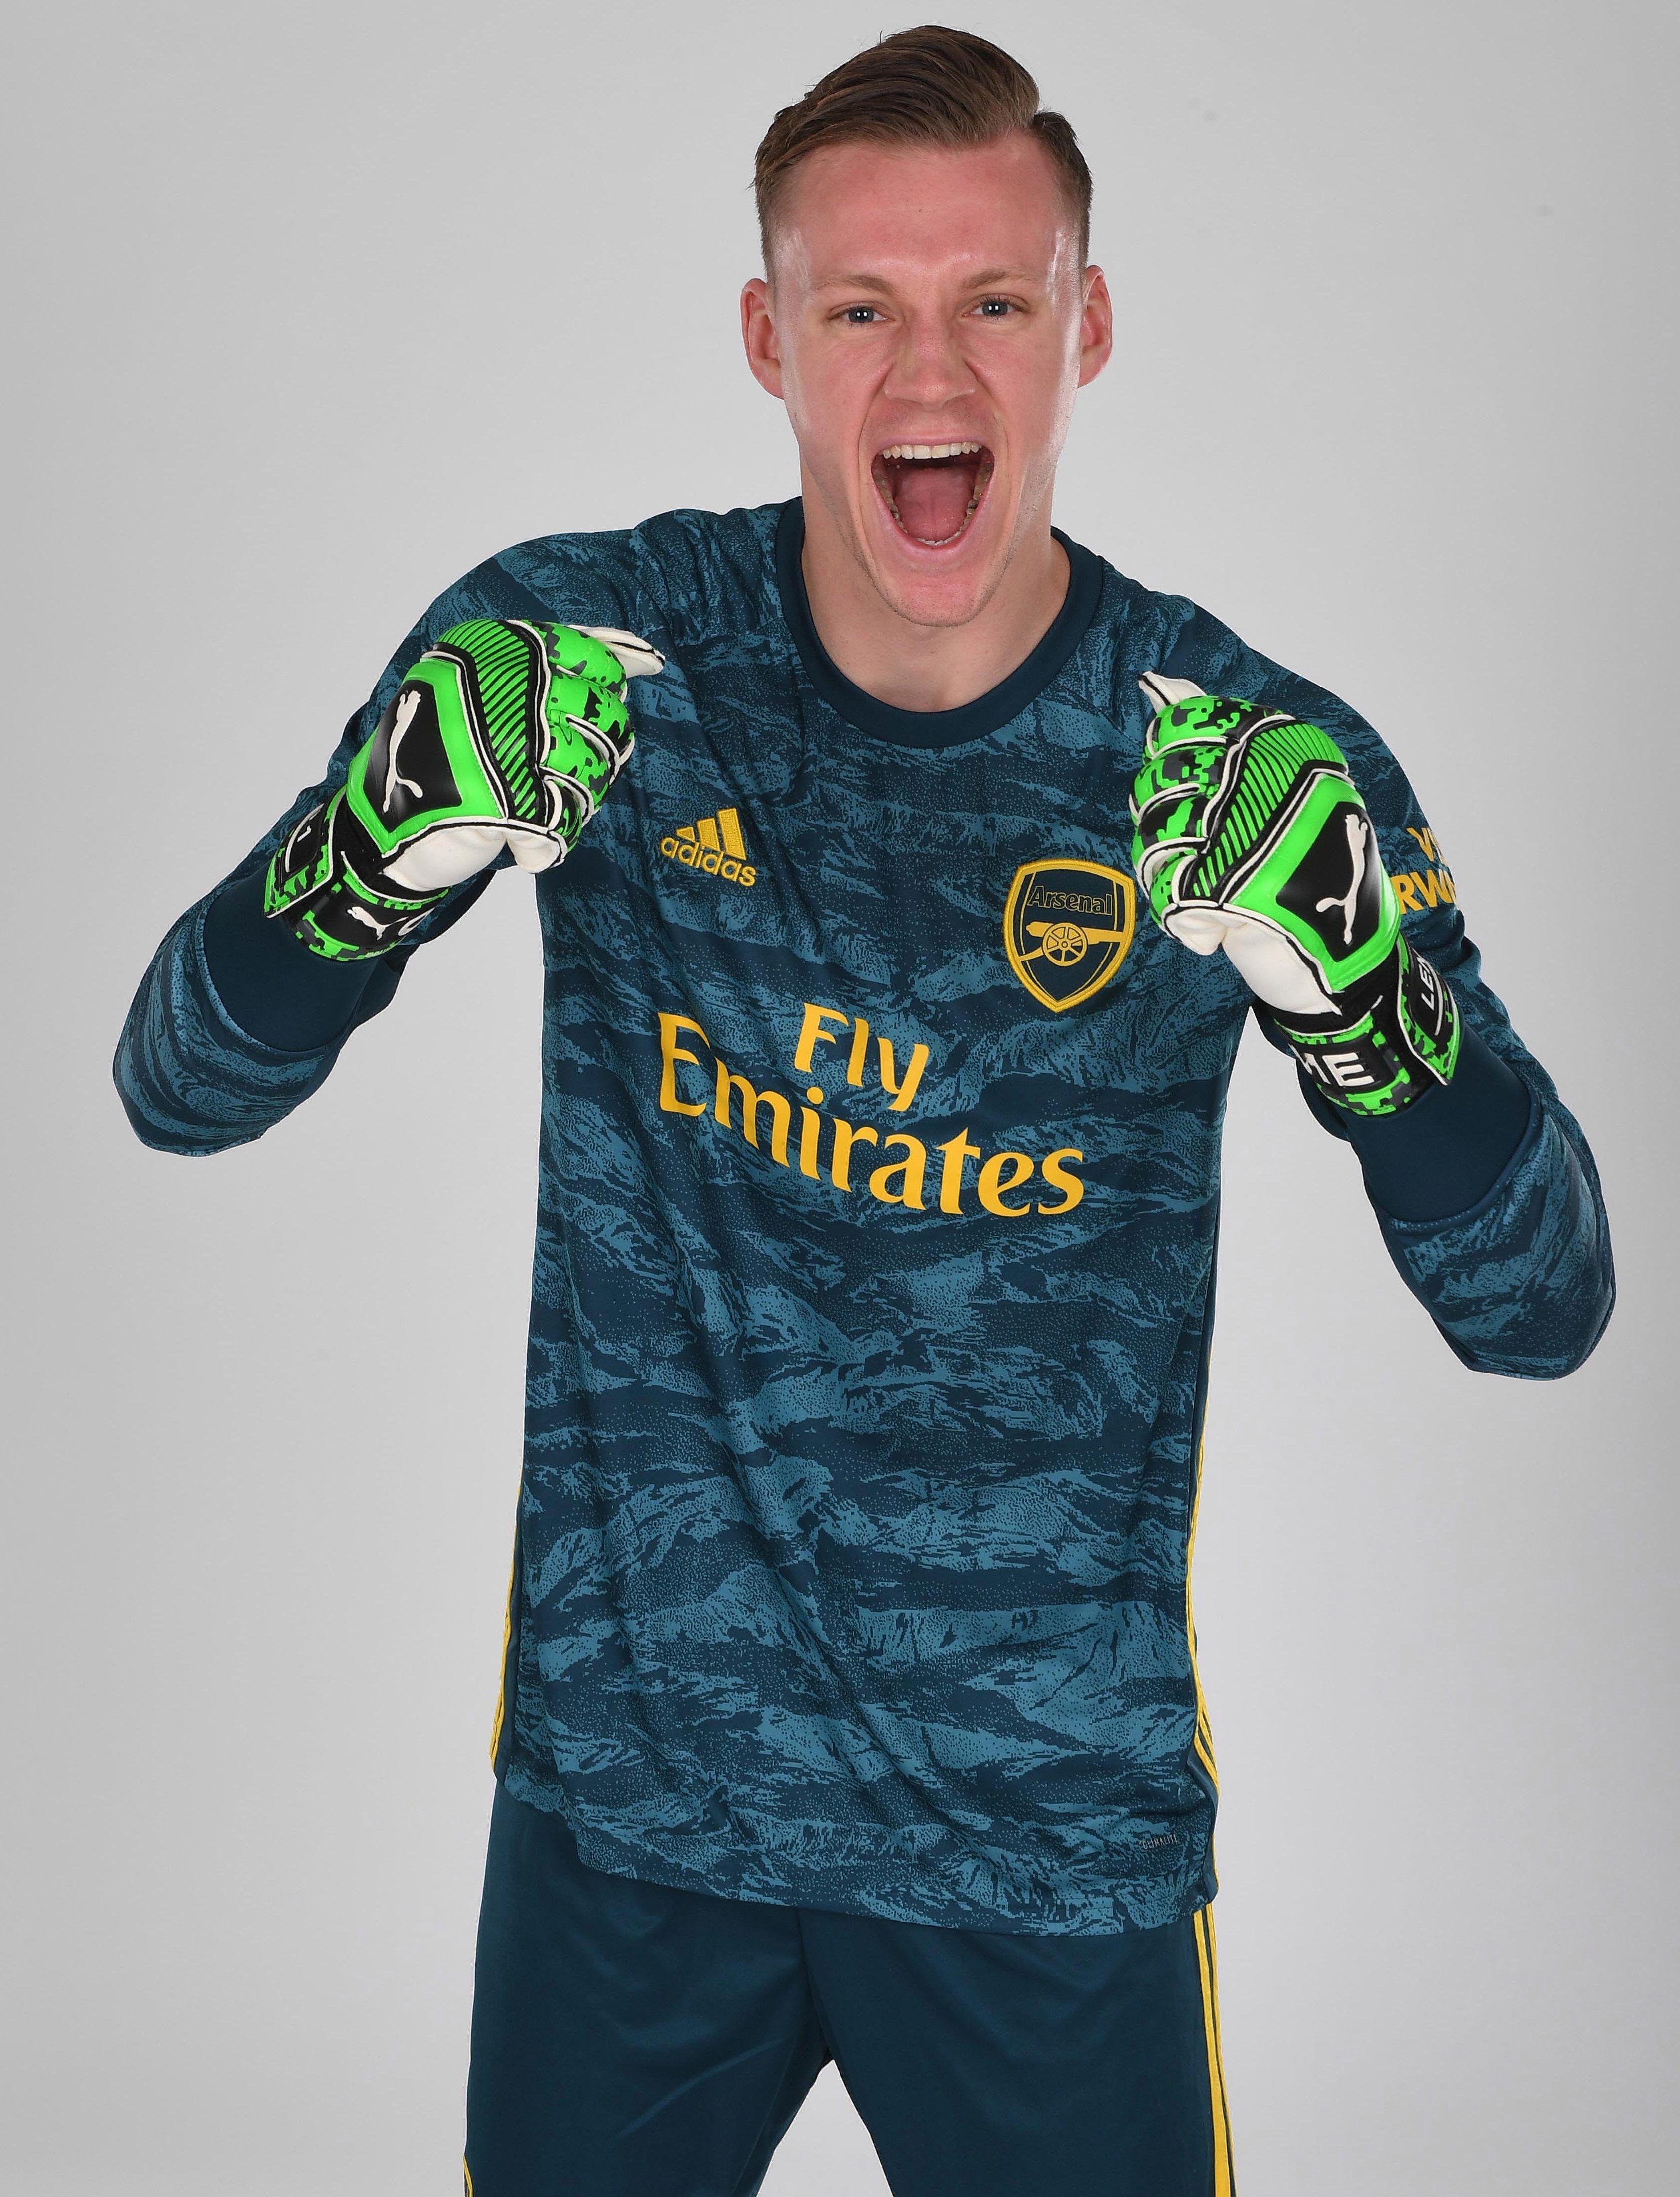 19 20 Arsenal Goalkeeper Green Long Sleeve Jerseys Shirt Long Sleeve Jersey Shirt Jersey Shirt Long Sleeve Jersey